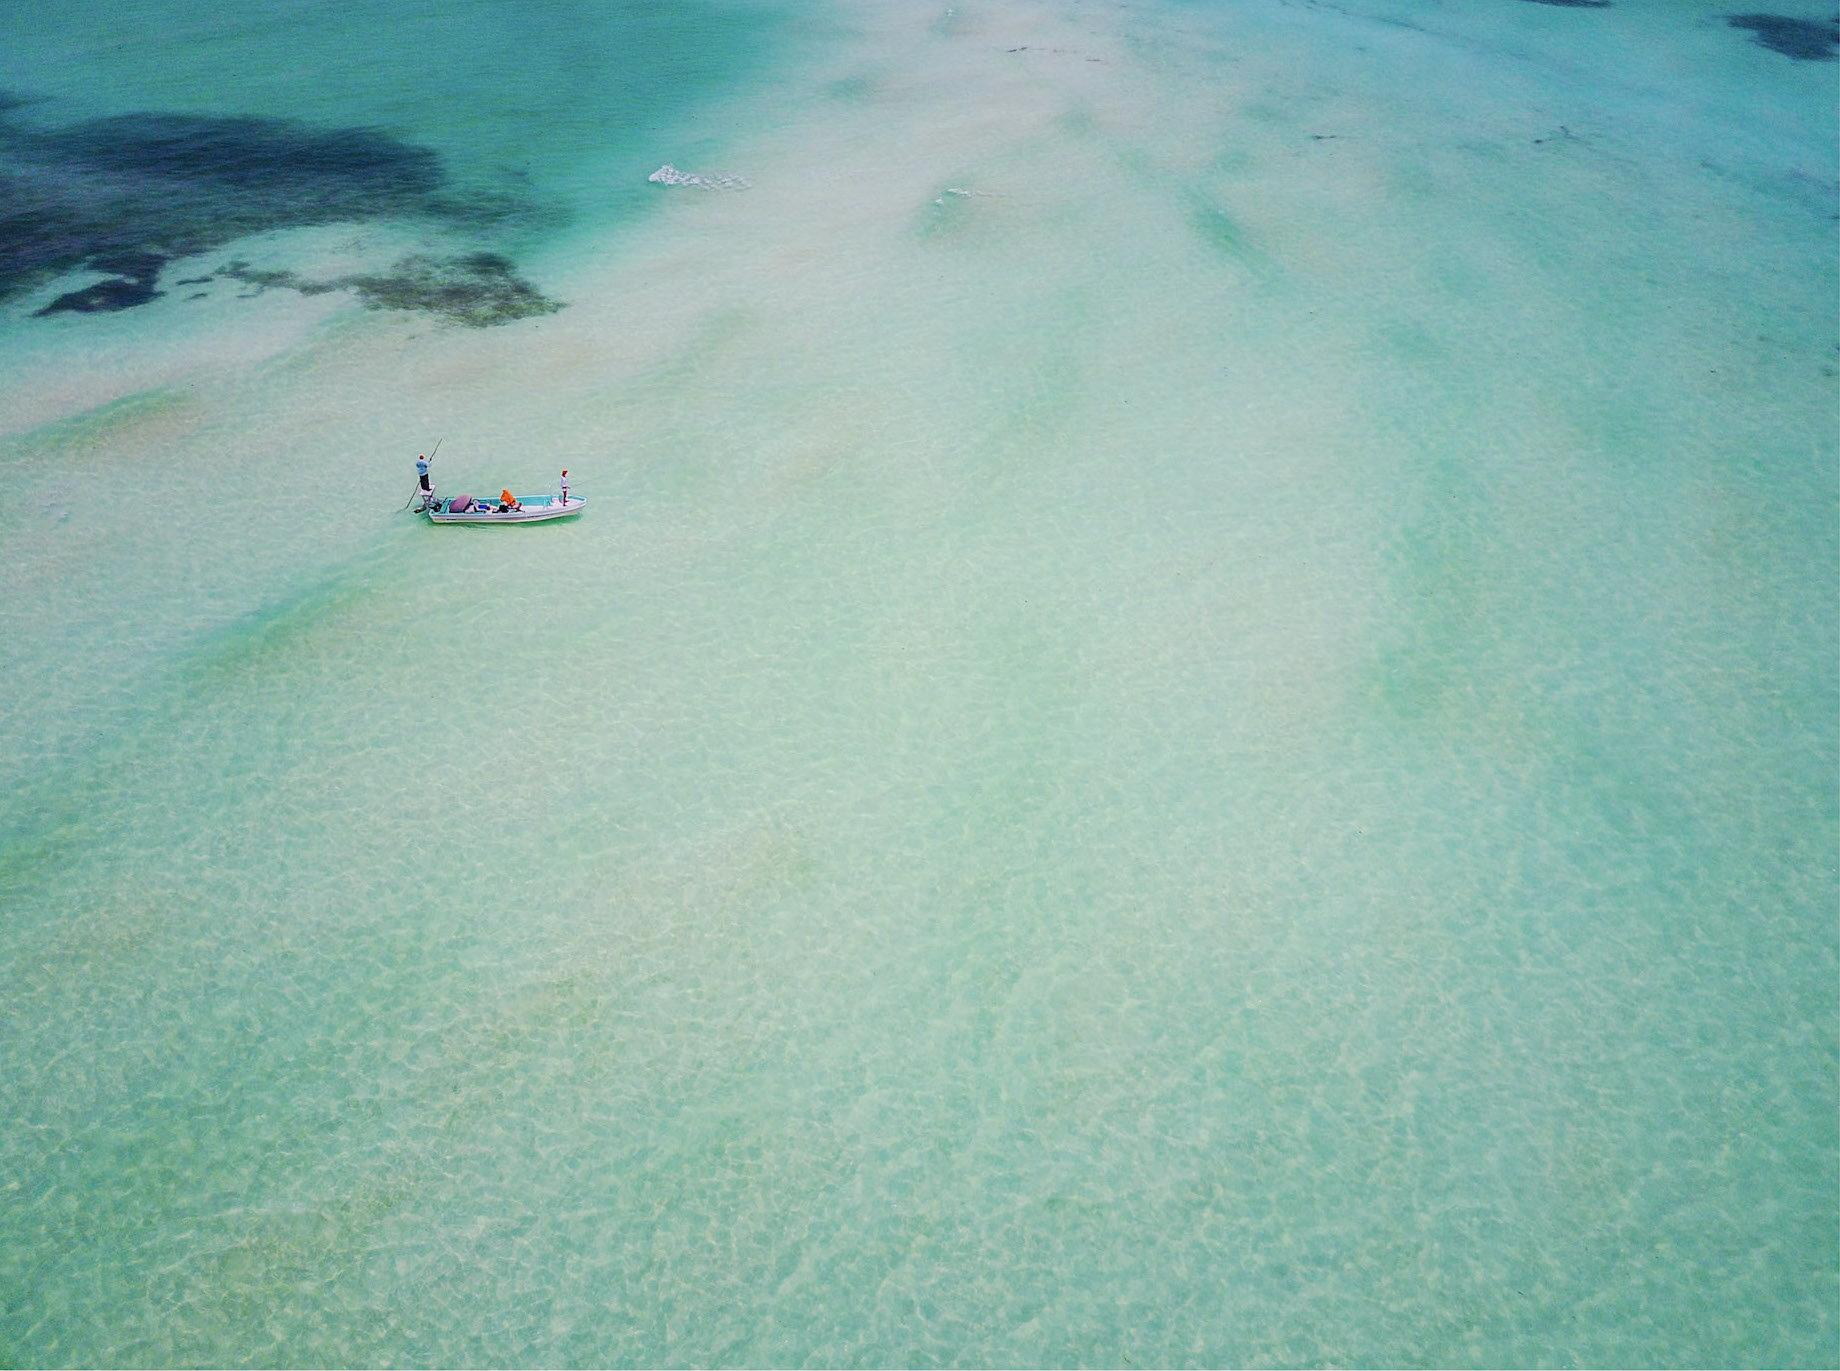 David Ondaatje   Tarpon Flat, Long Cay, Belize  62.5 x 48 inch Archival Pigment Print